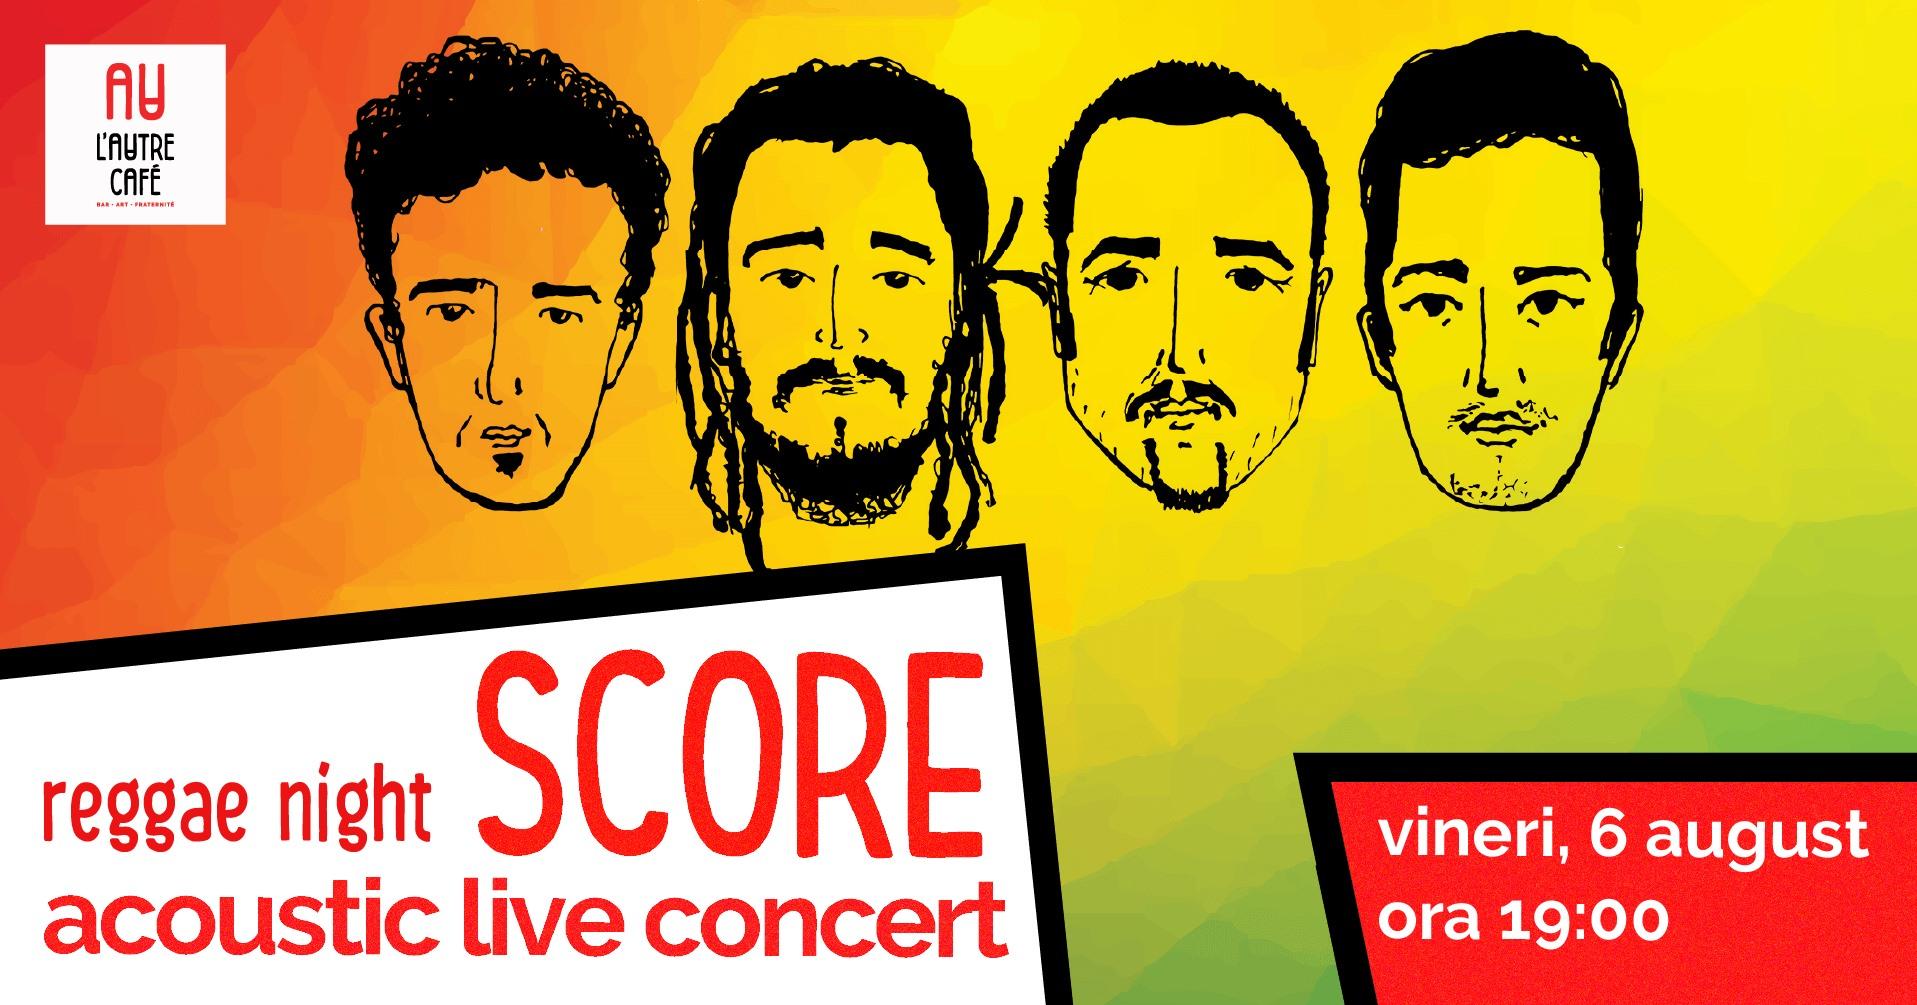 Concert live acustic - SCORE - Reggae night - @L'Autre Caffee